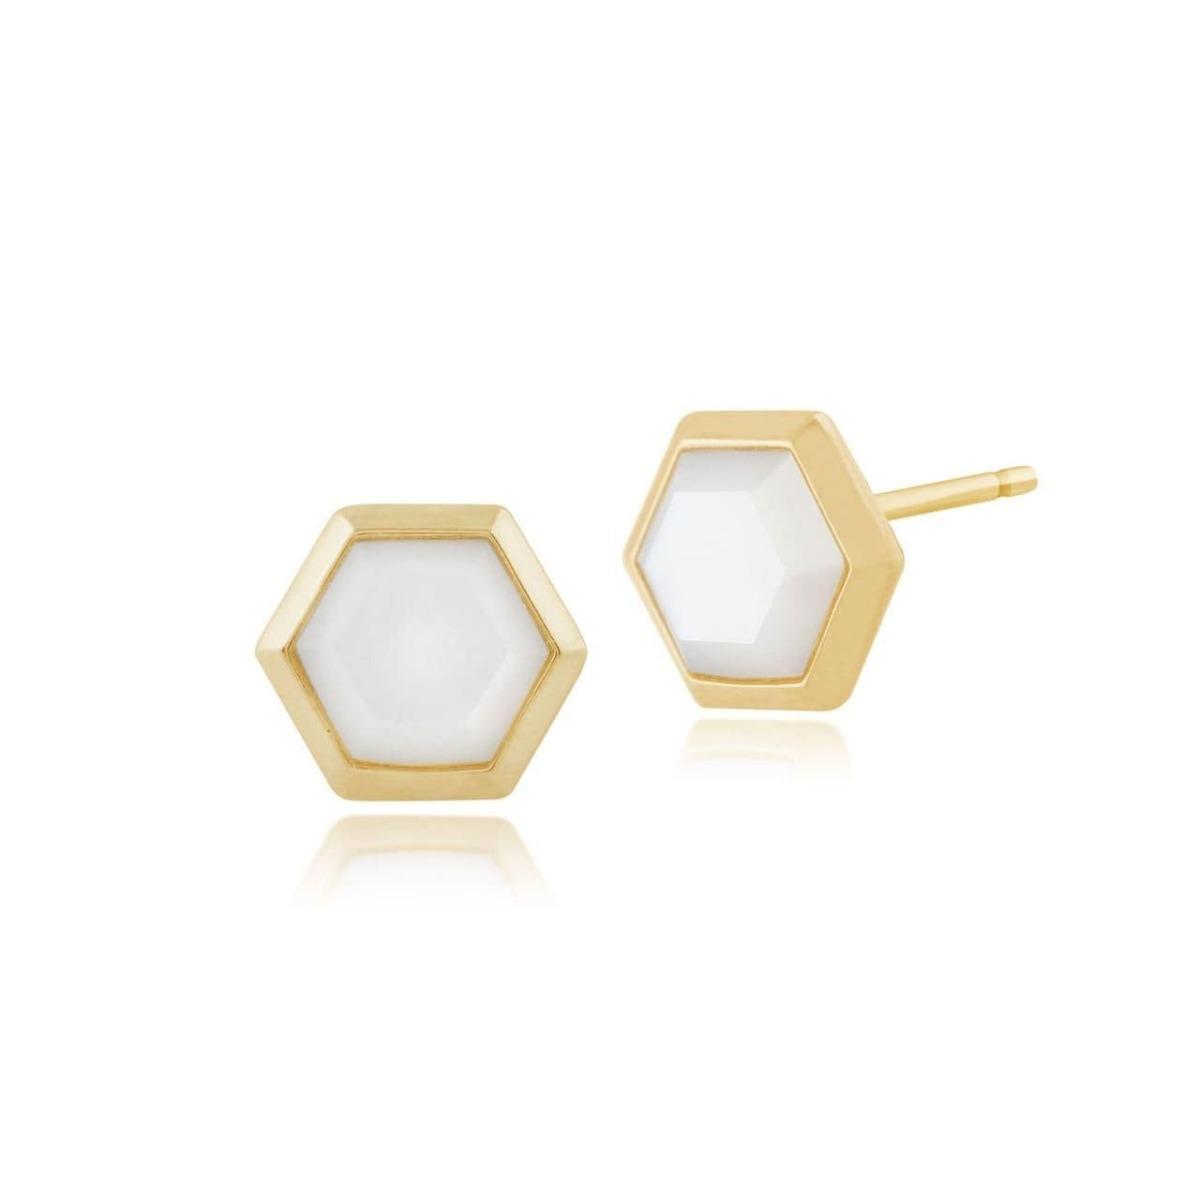 Gemondo Mother of Pearl Hexagon Stud Earrings